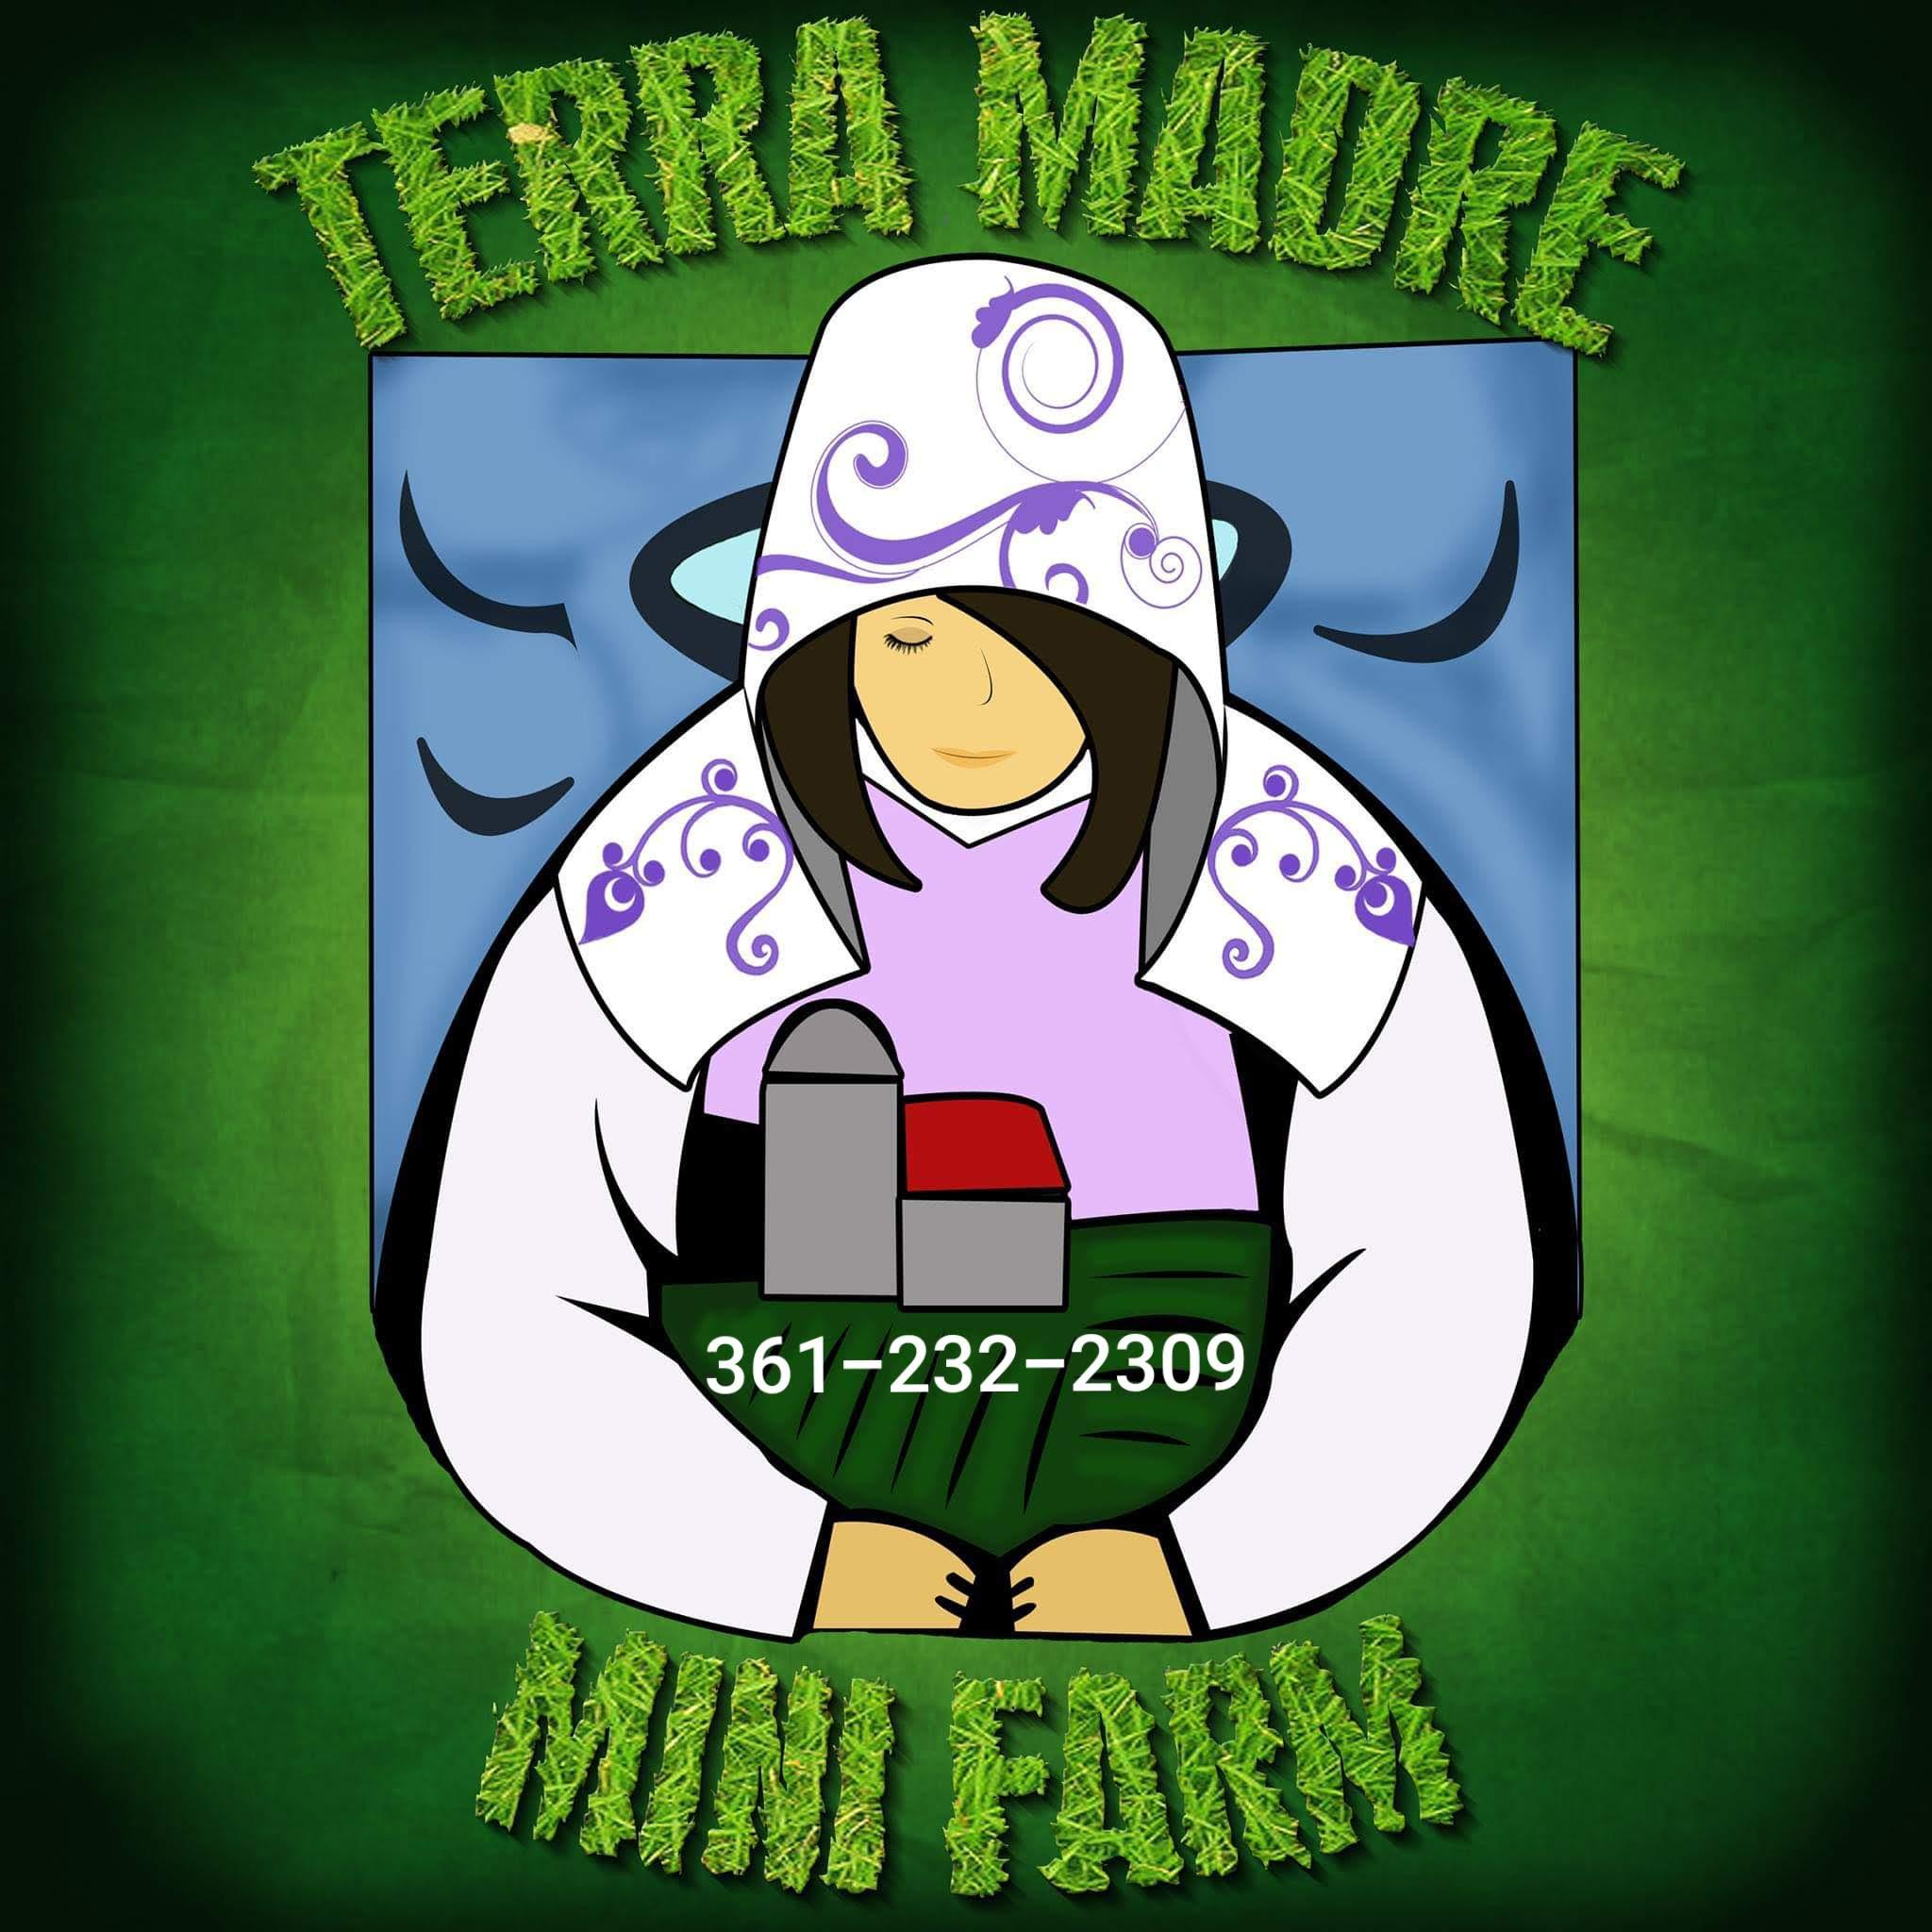 Terra Madre Mini Farm